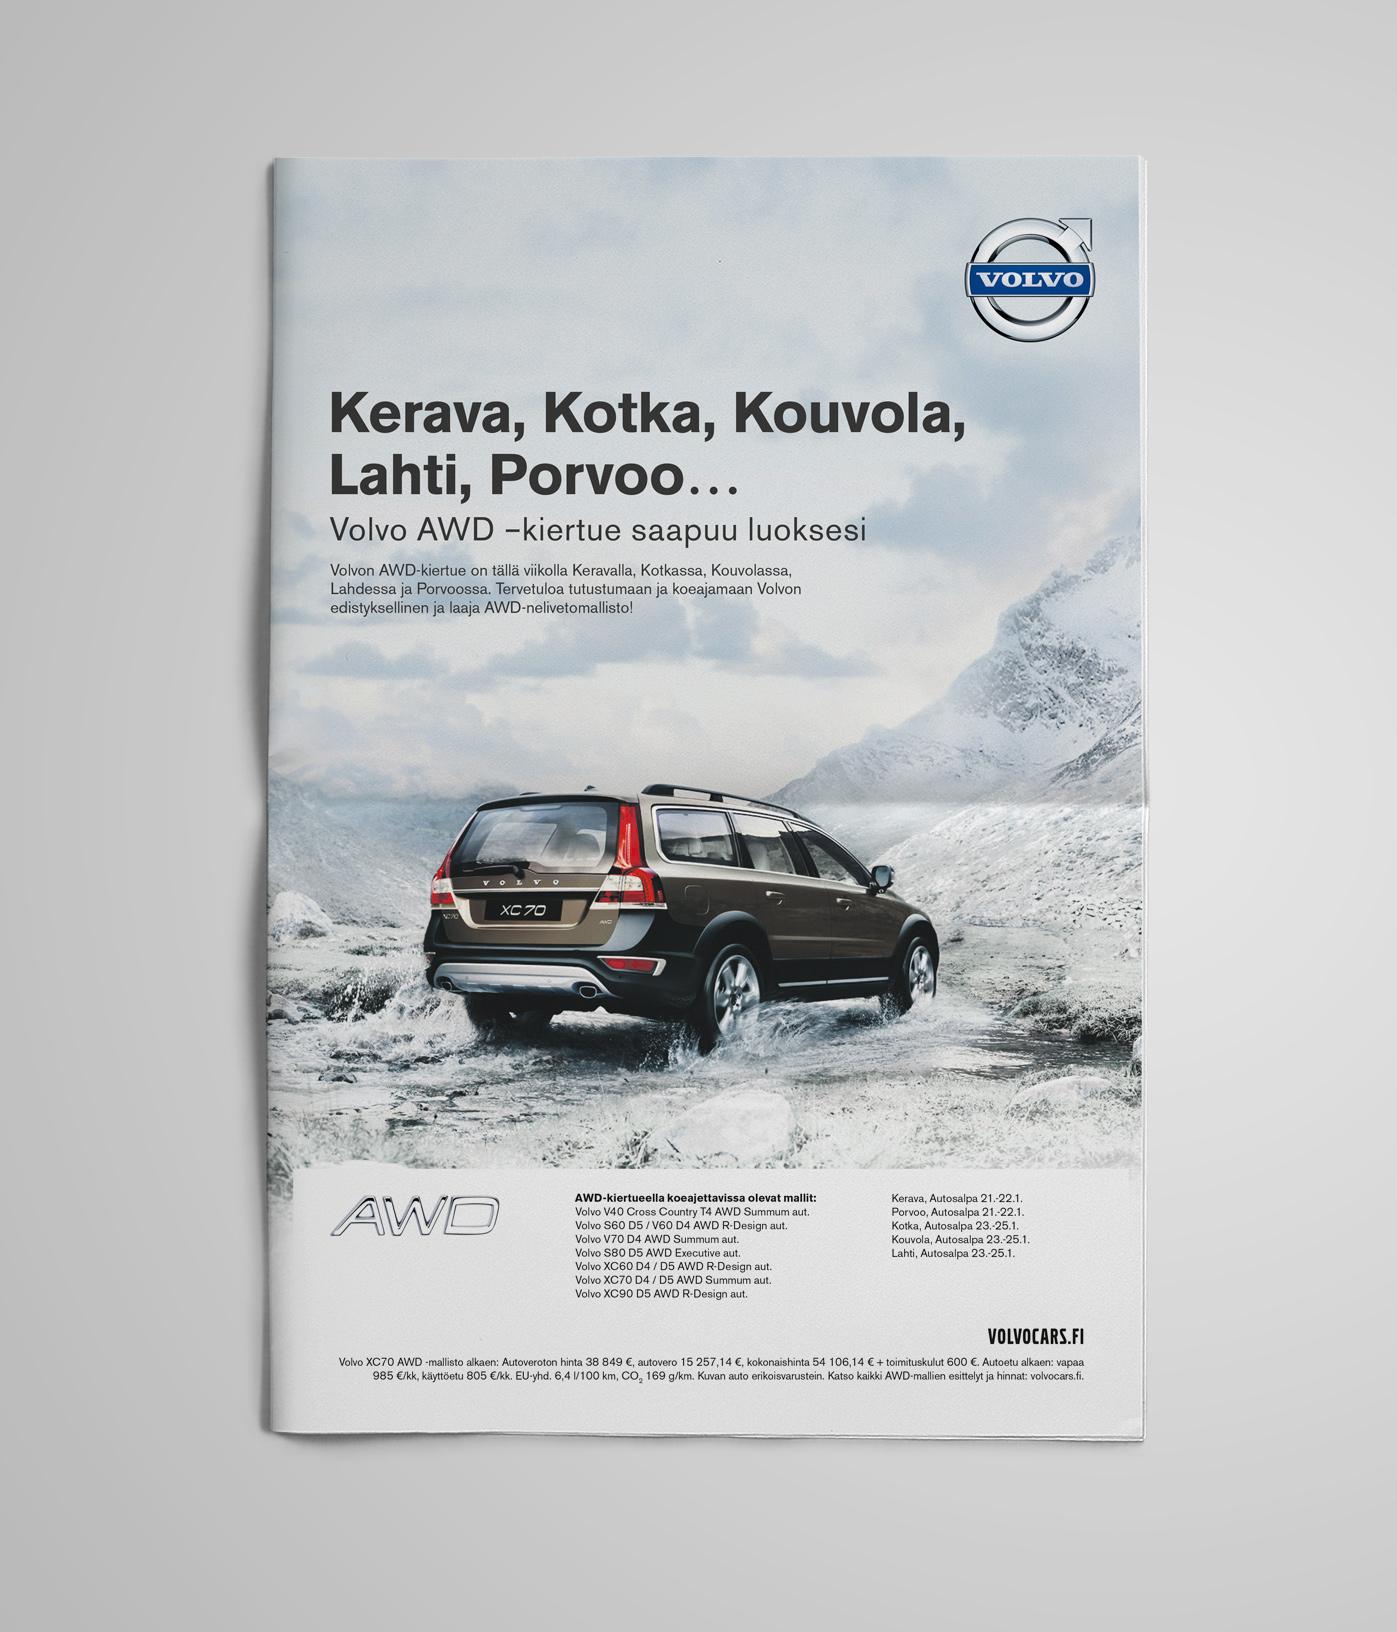 Volvo AWD Newspaper